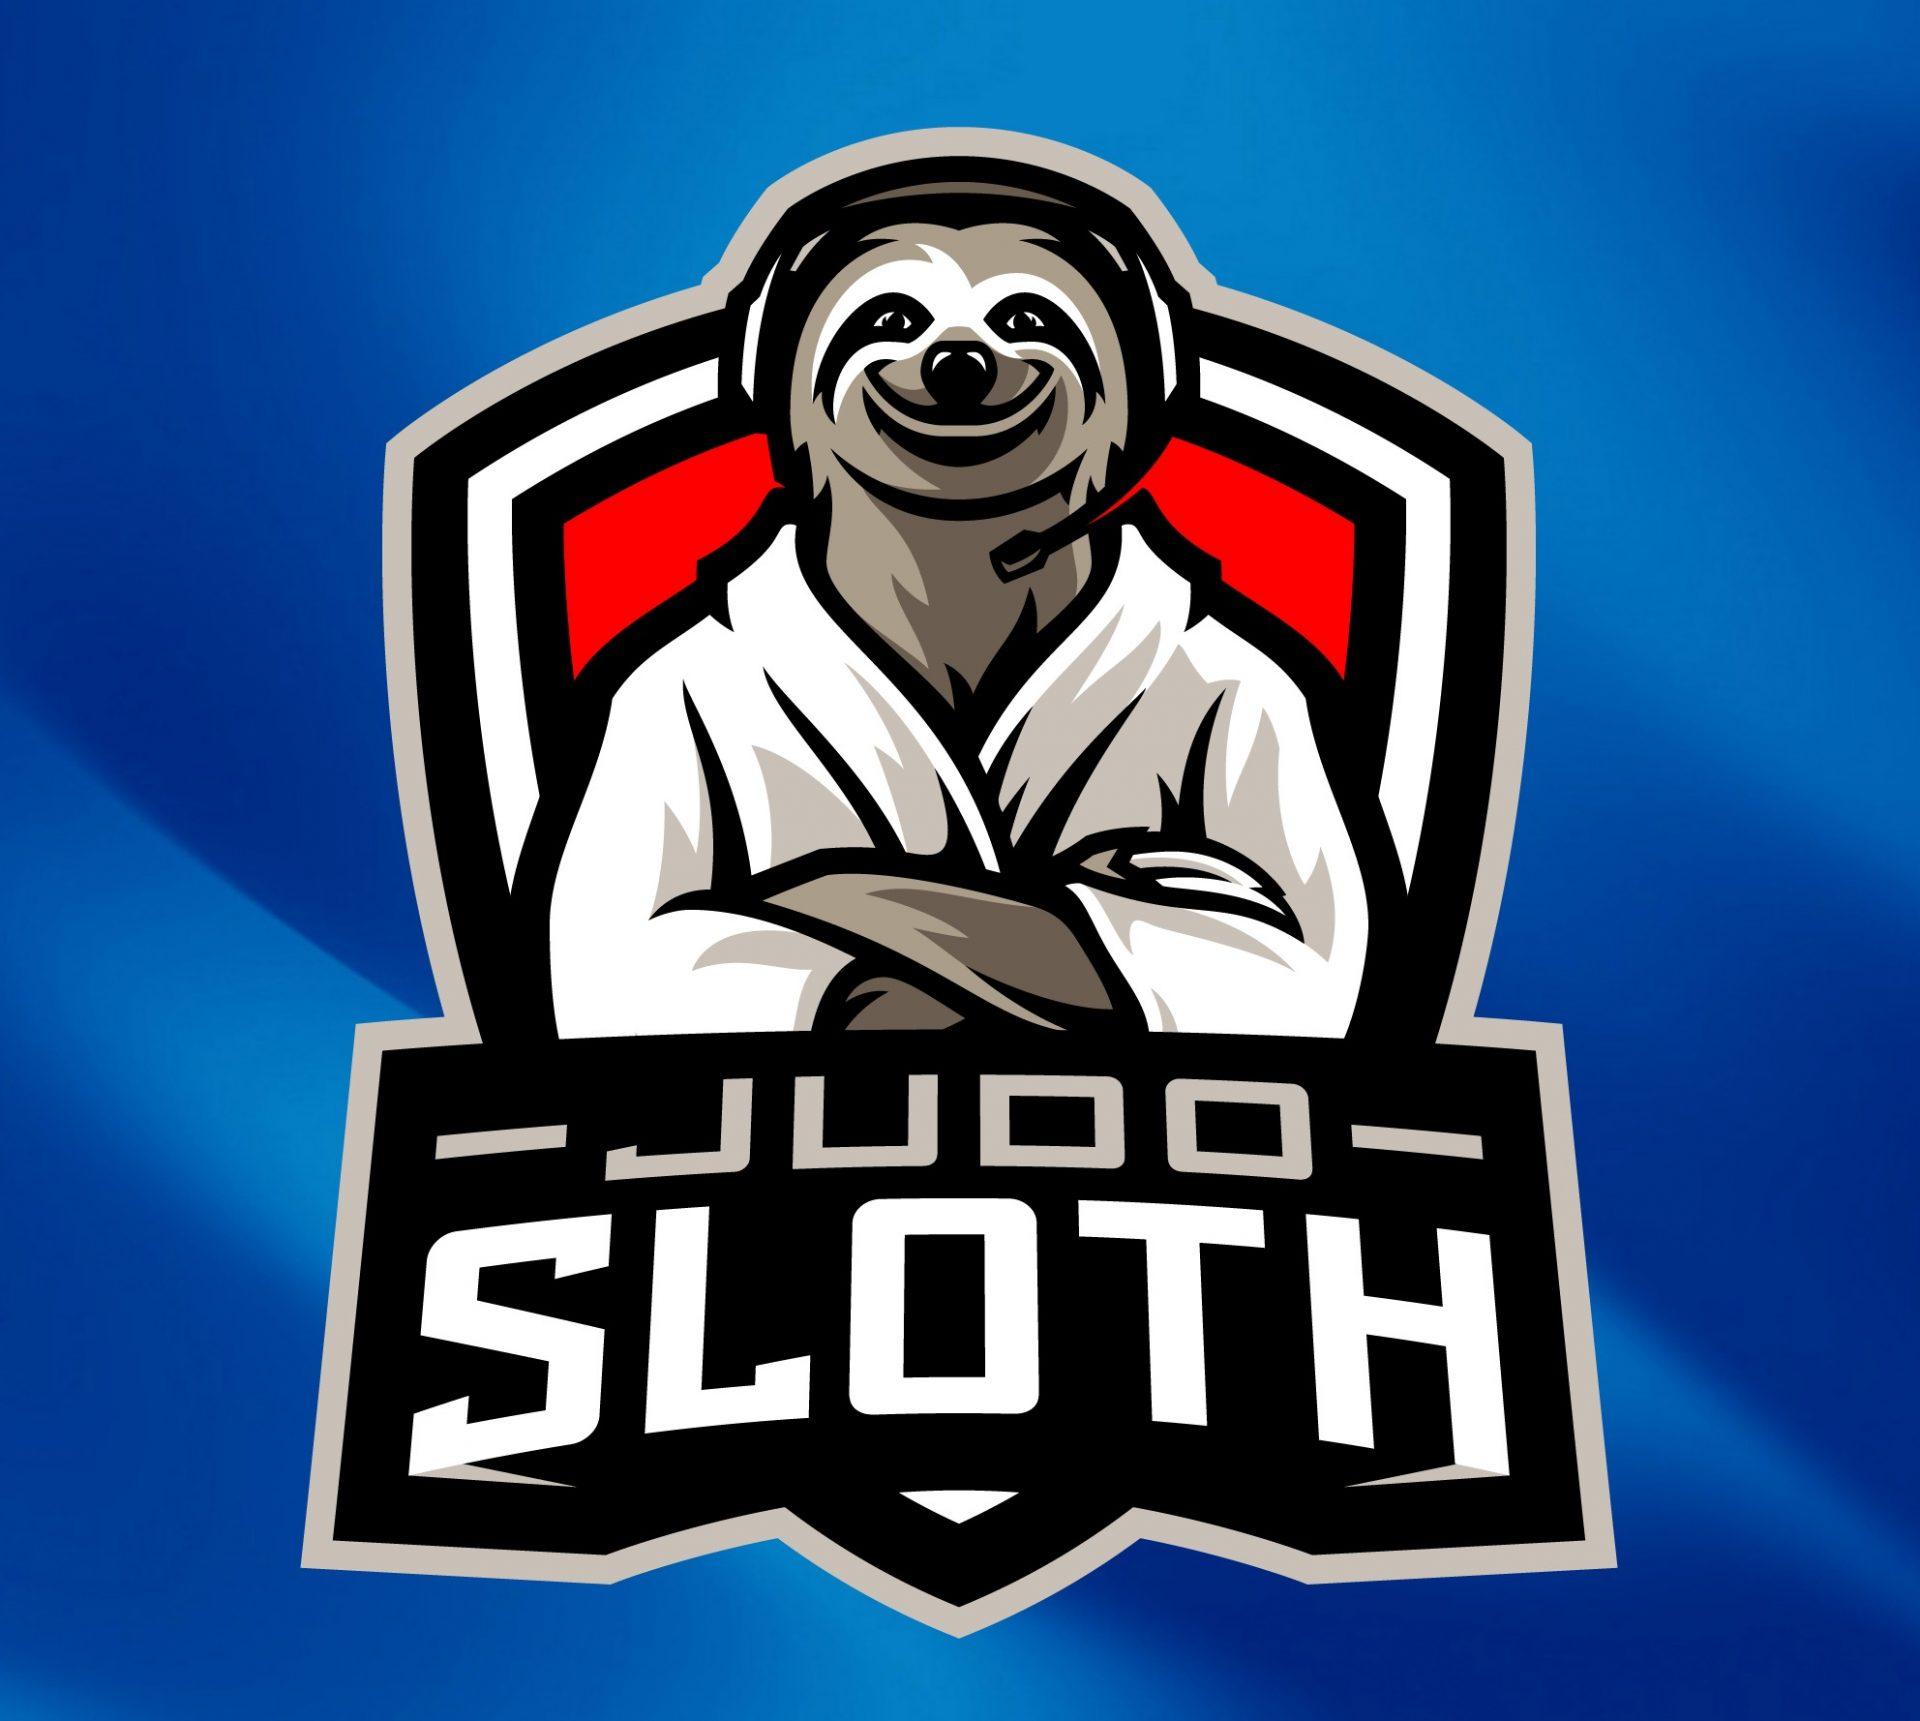 JudoSloth